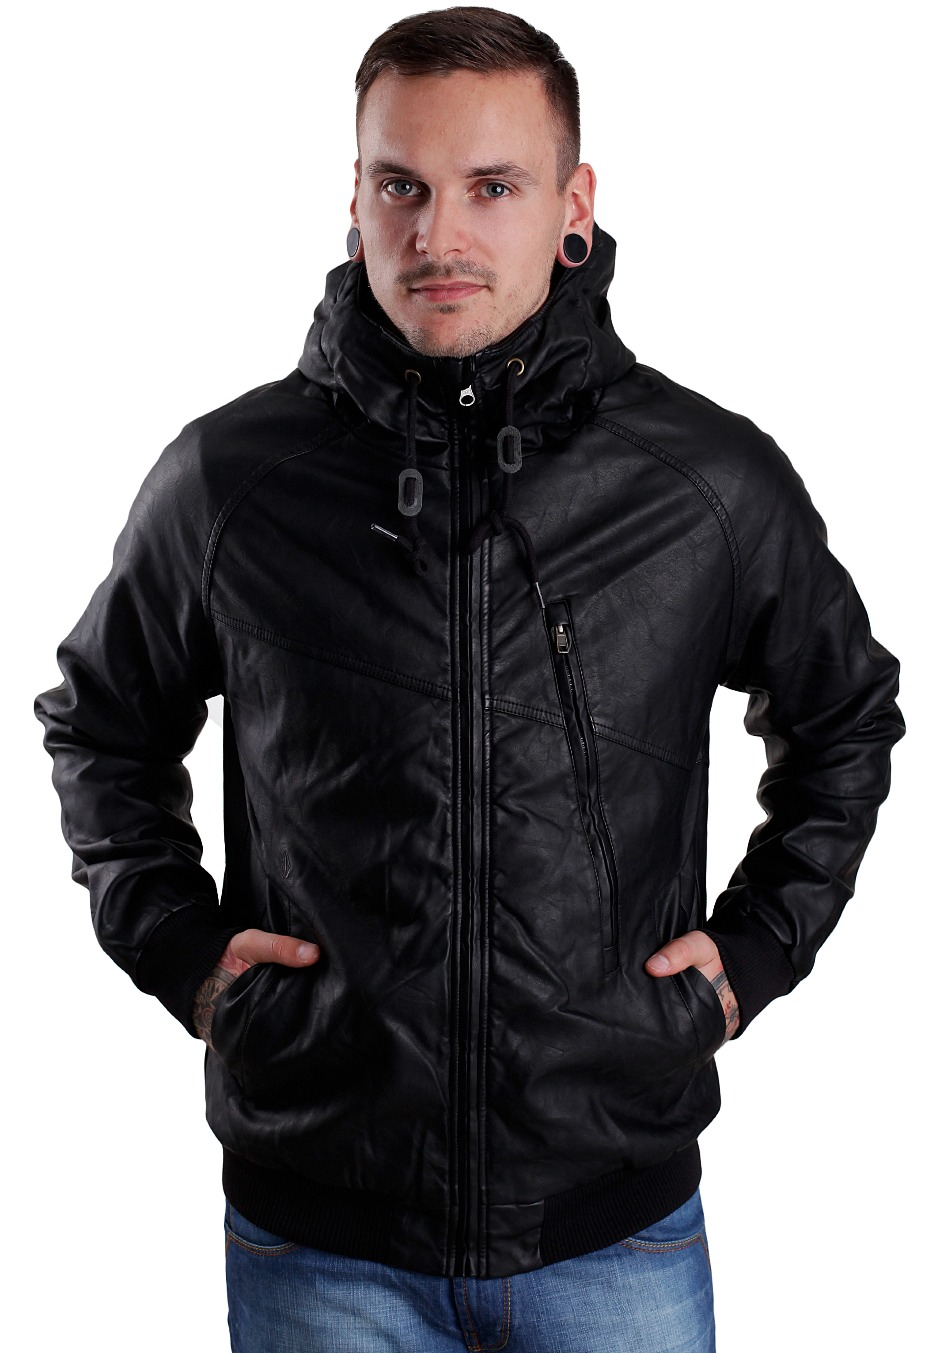 71c248102a0a Volcom - Hernan III Black Combo - Leather Jacket - Streetwear Shop ...